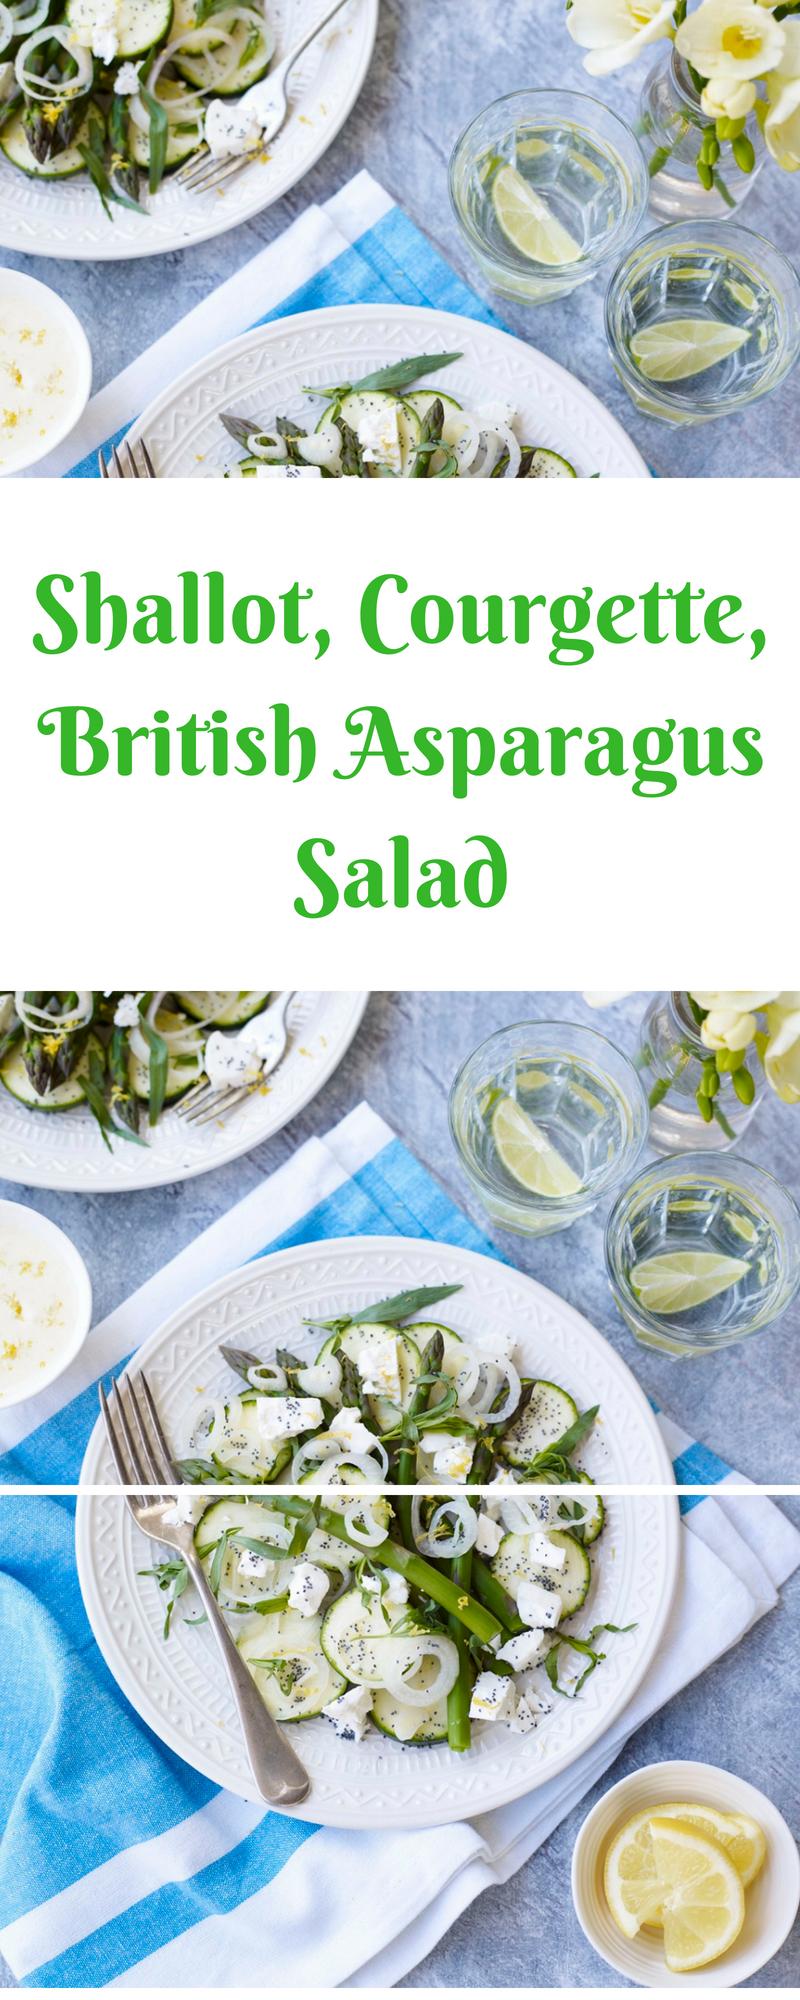 Shallot, Courgette, British Asparagus Salad